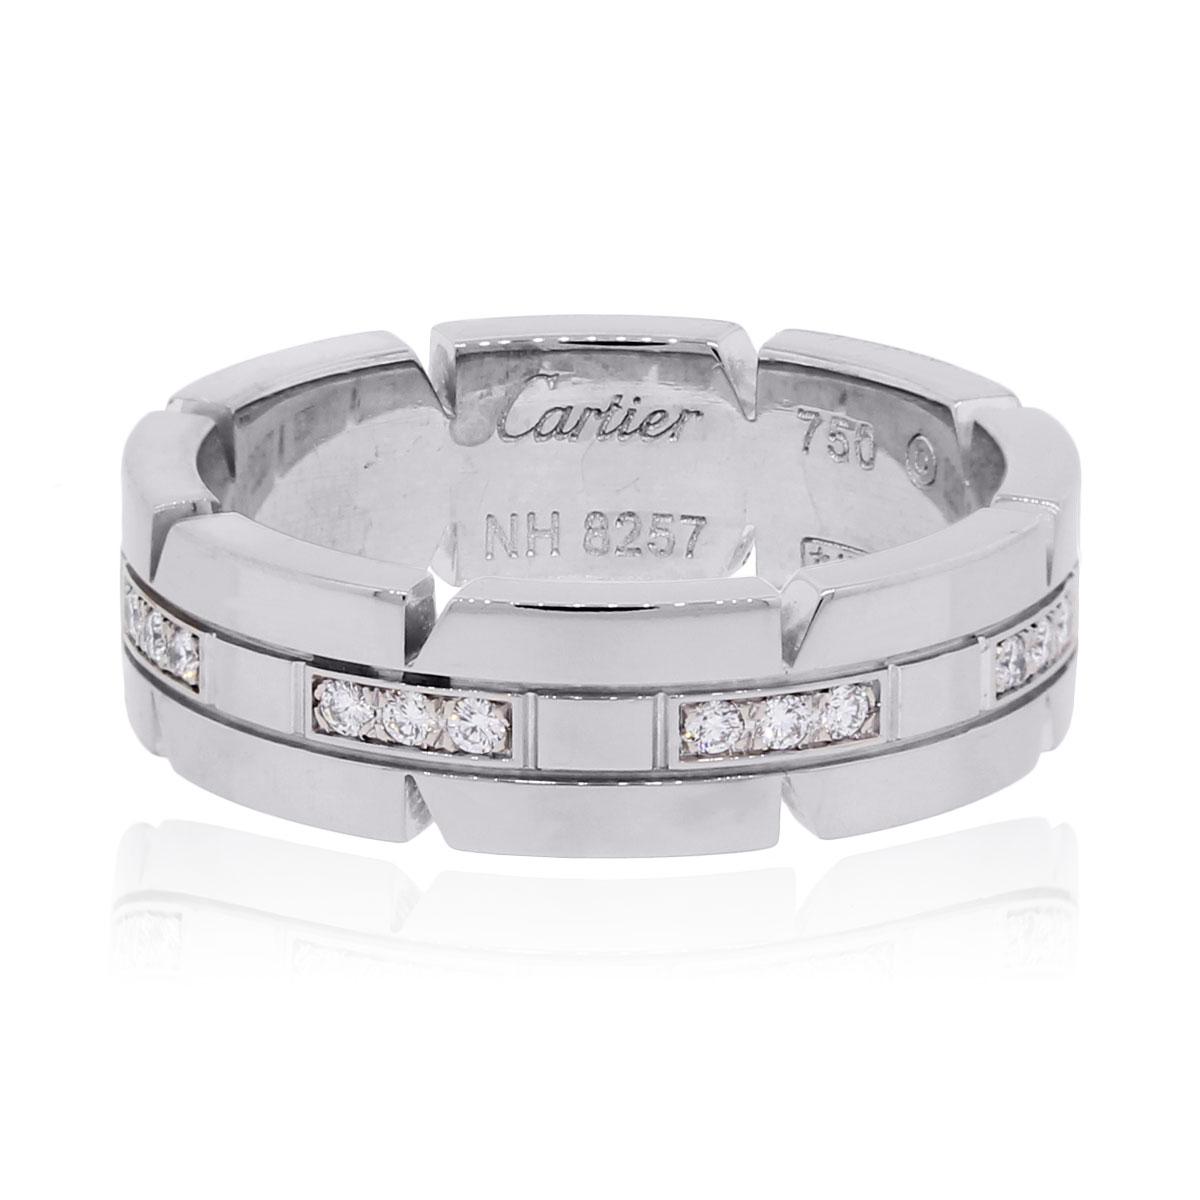 Cartier 18k Tank Francaise Diamond Wedding Band White Gold